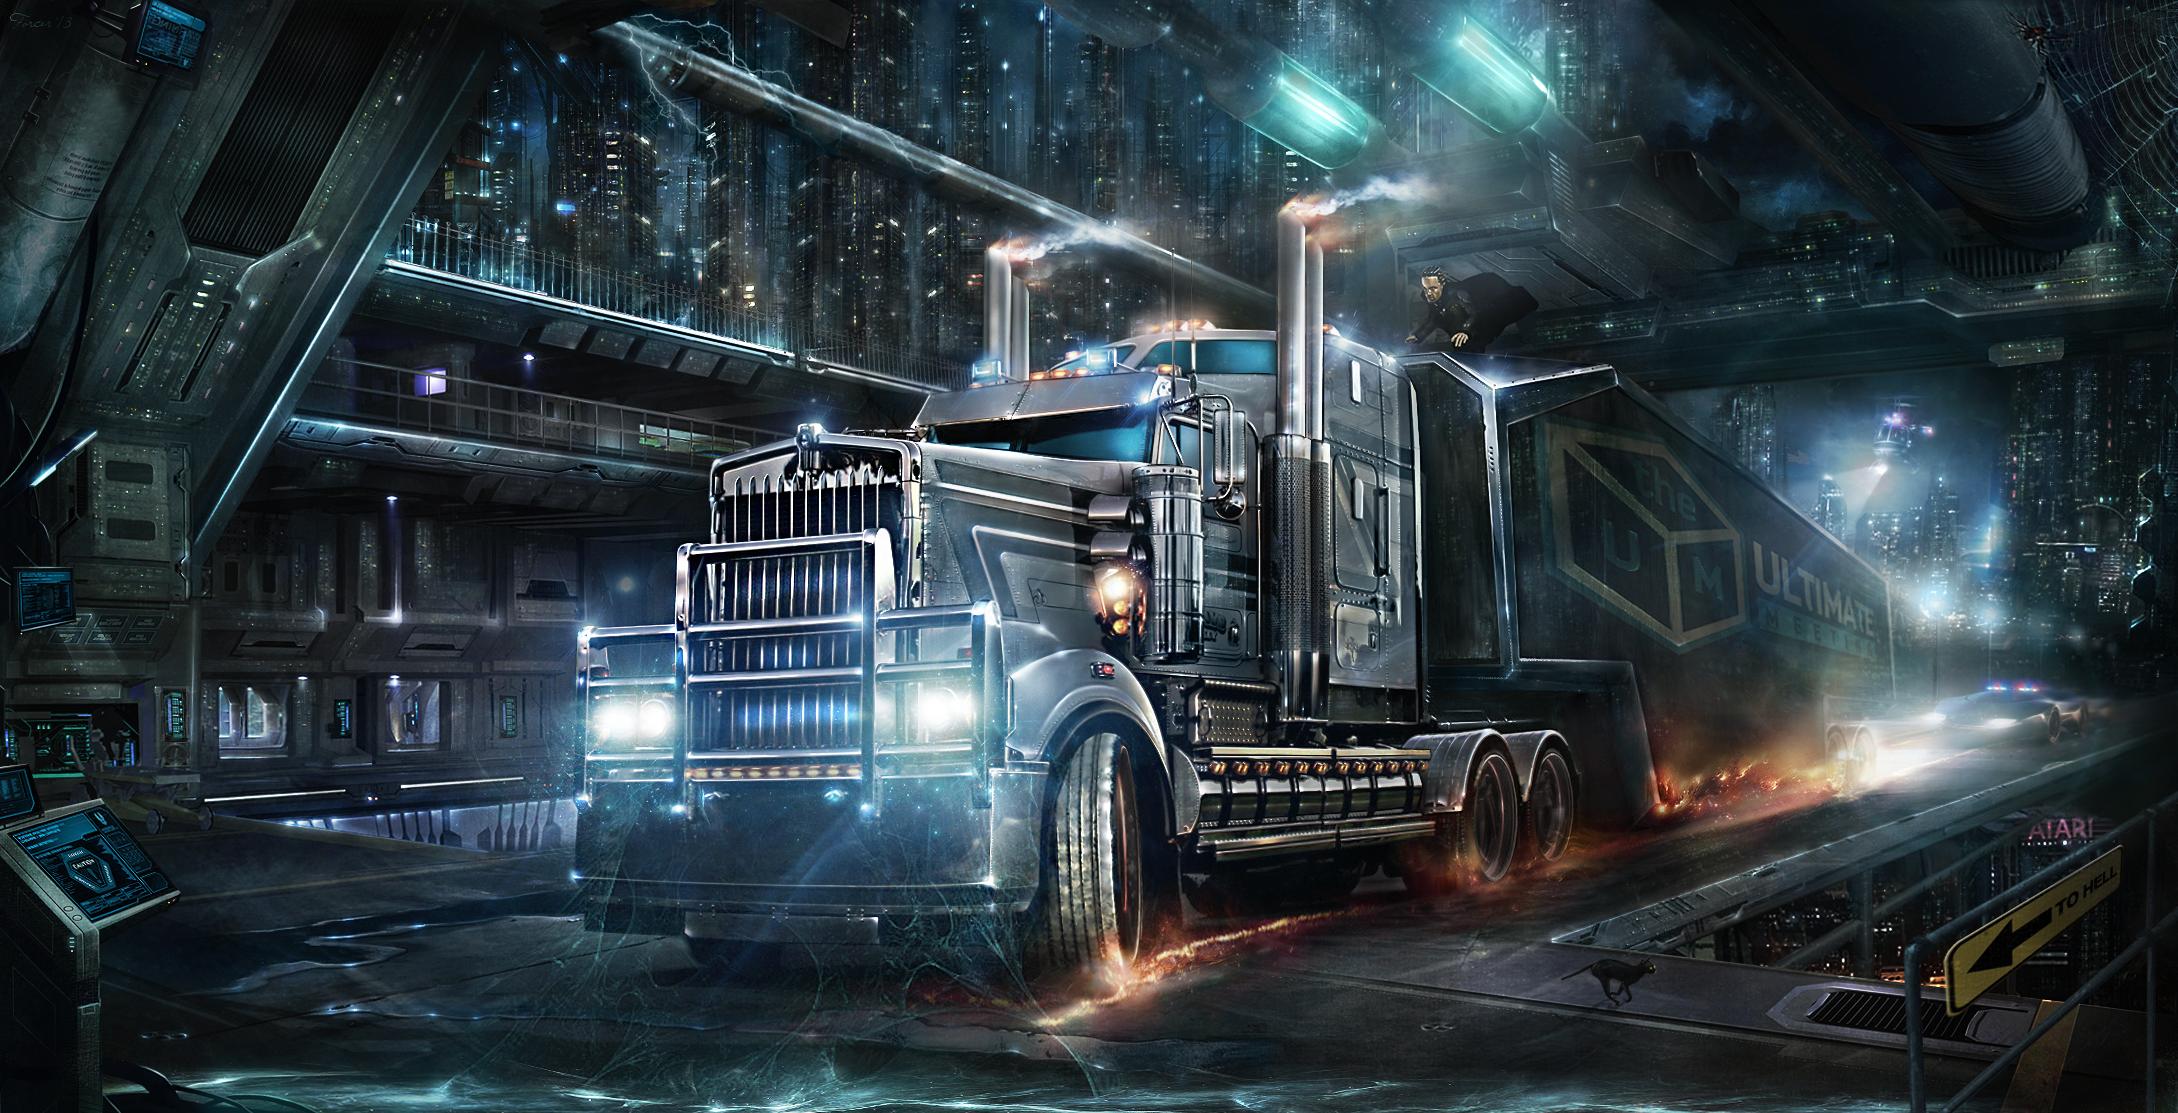 Image Result For Cyberpunk Trucks Train Illustration Truck Wallpaper Kenworth